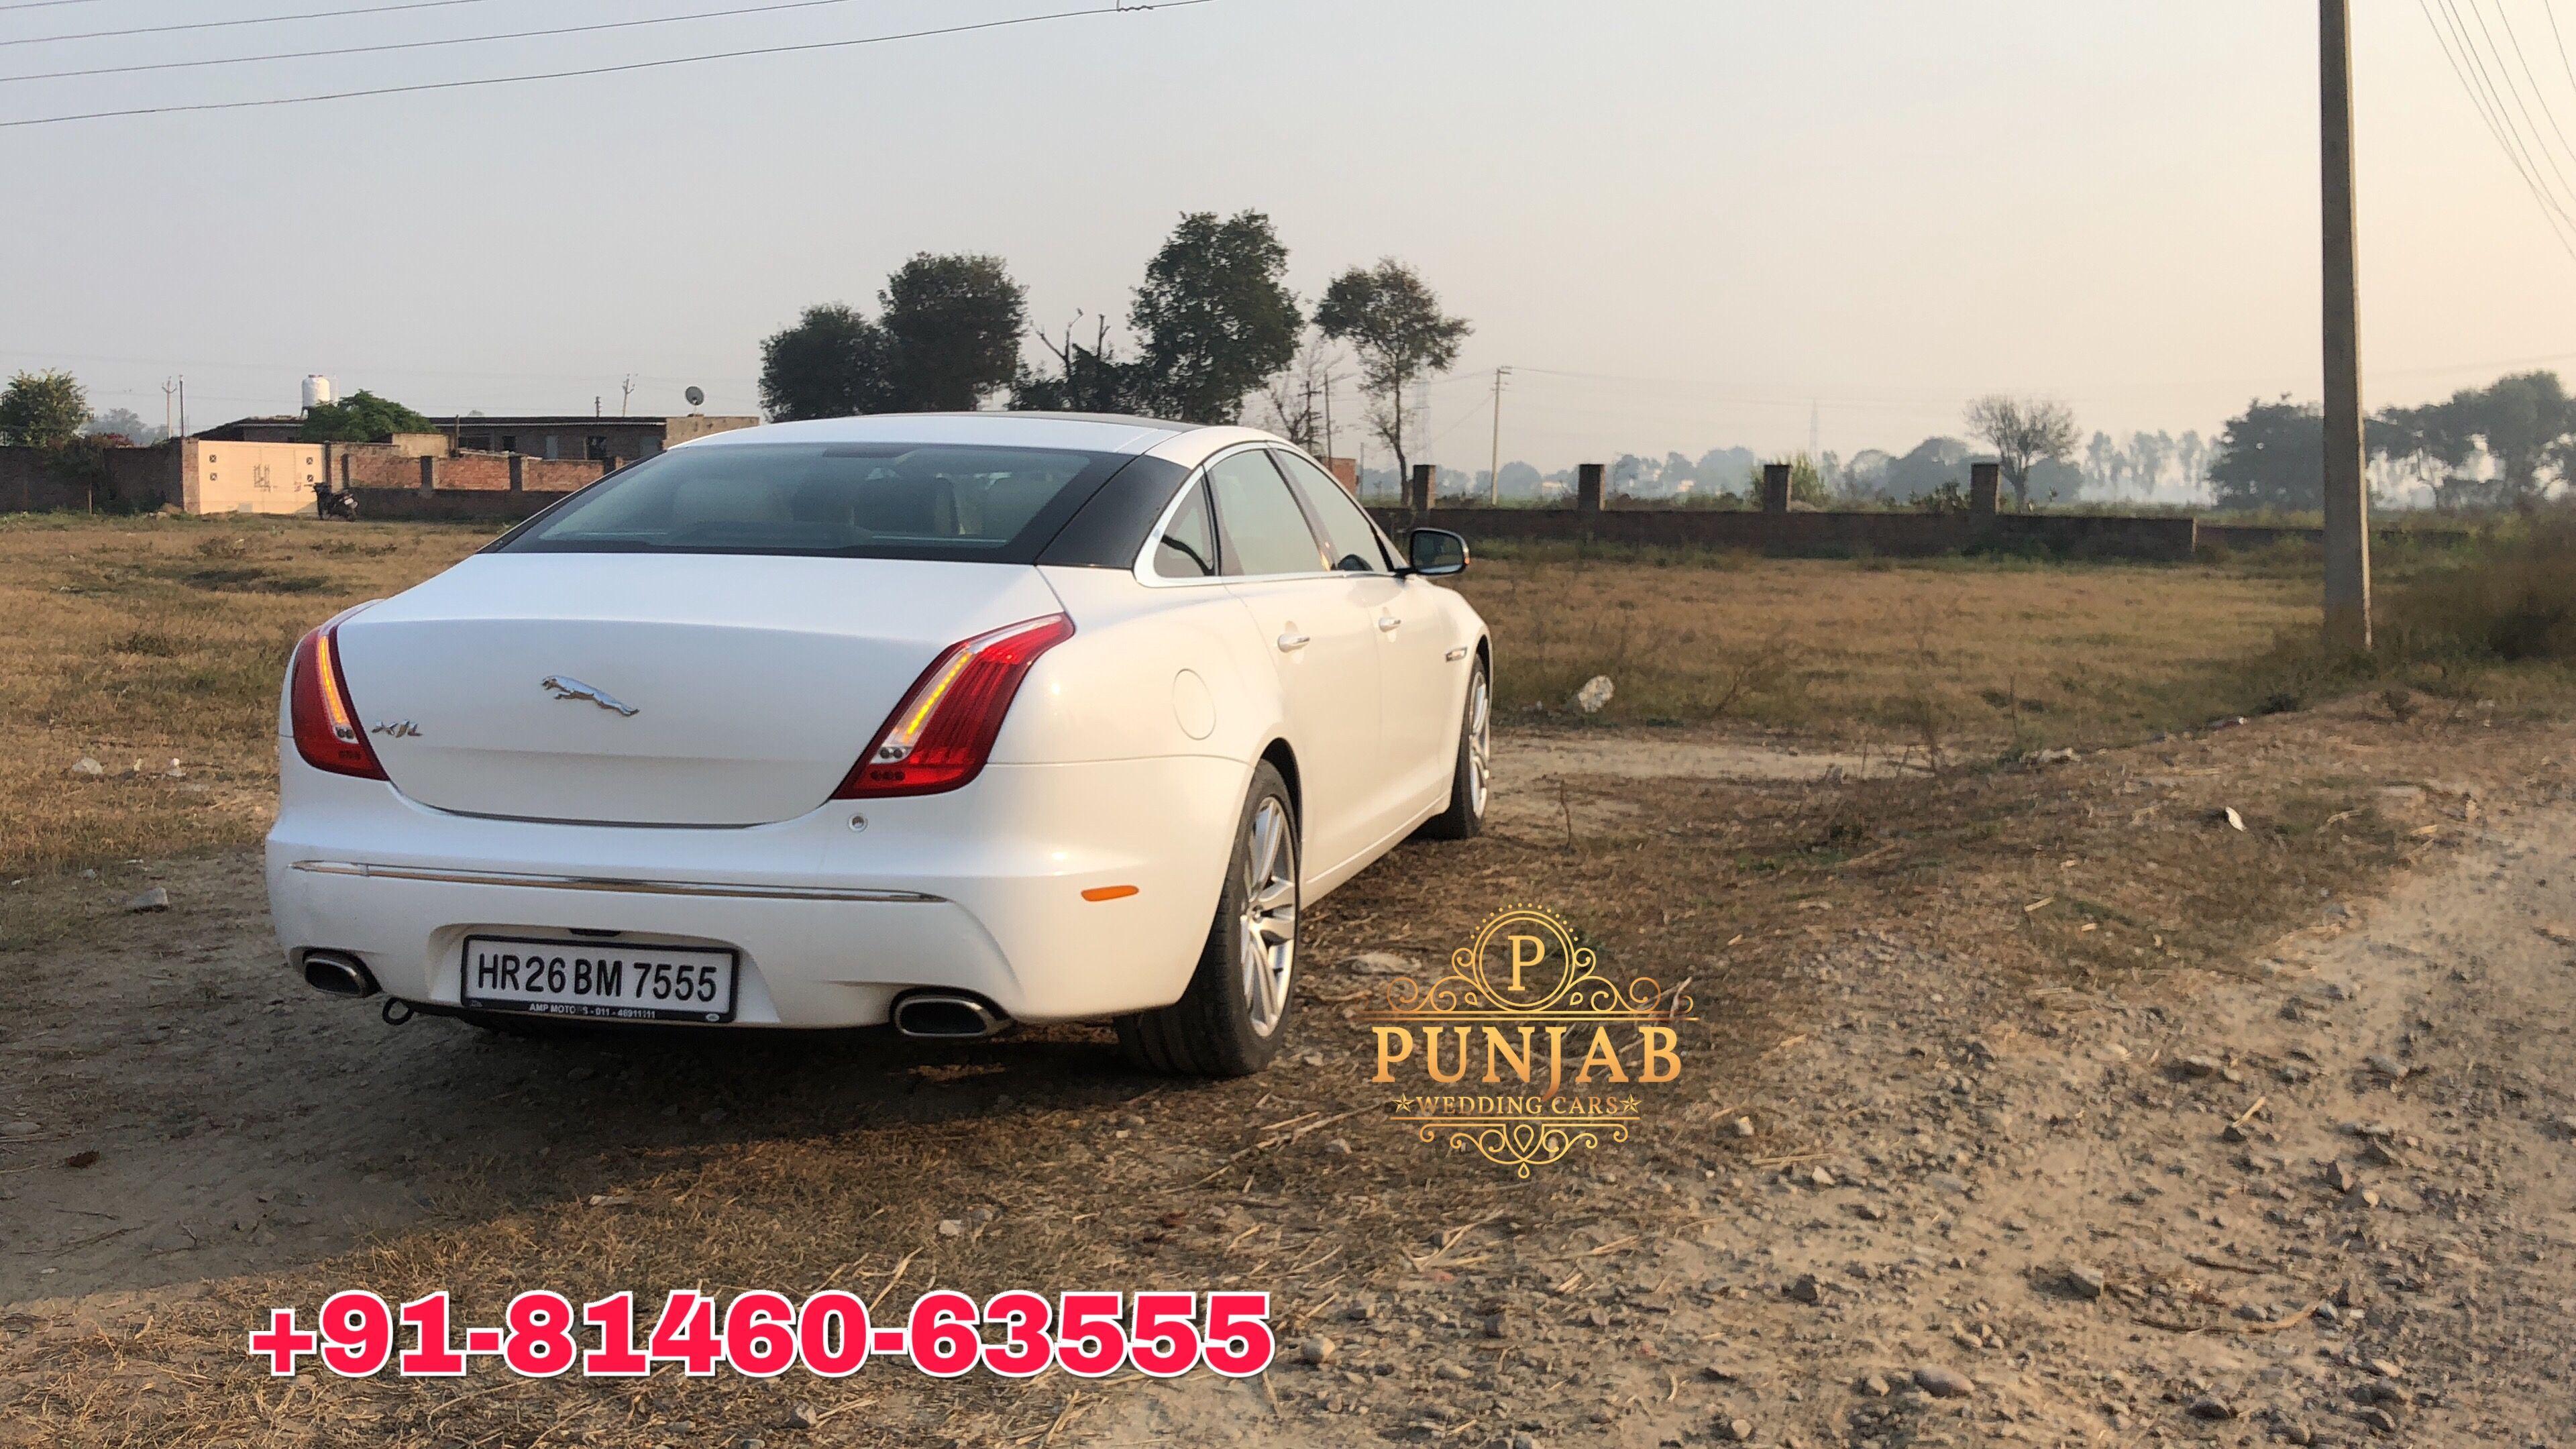 Car Sale In Punjab 2020